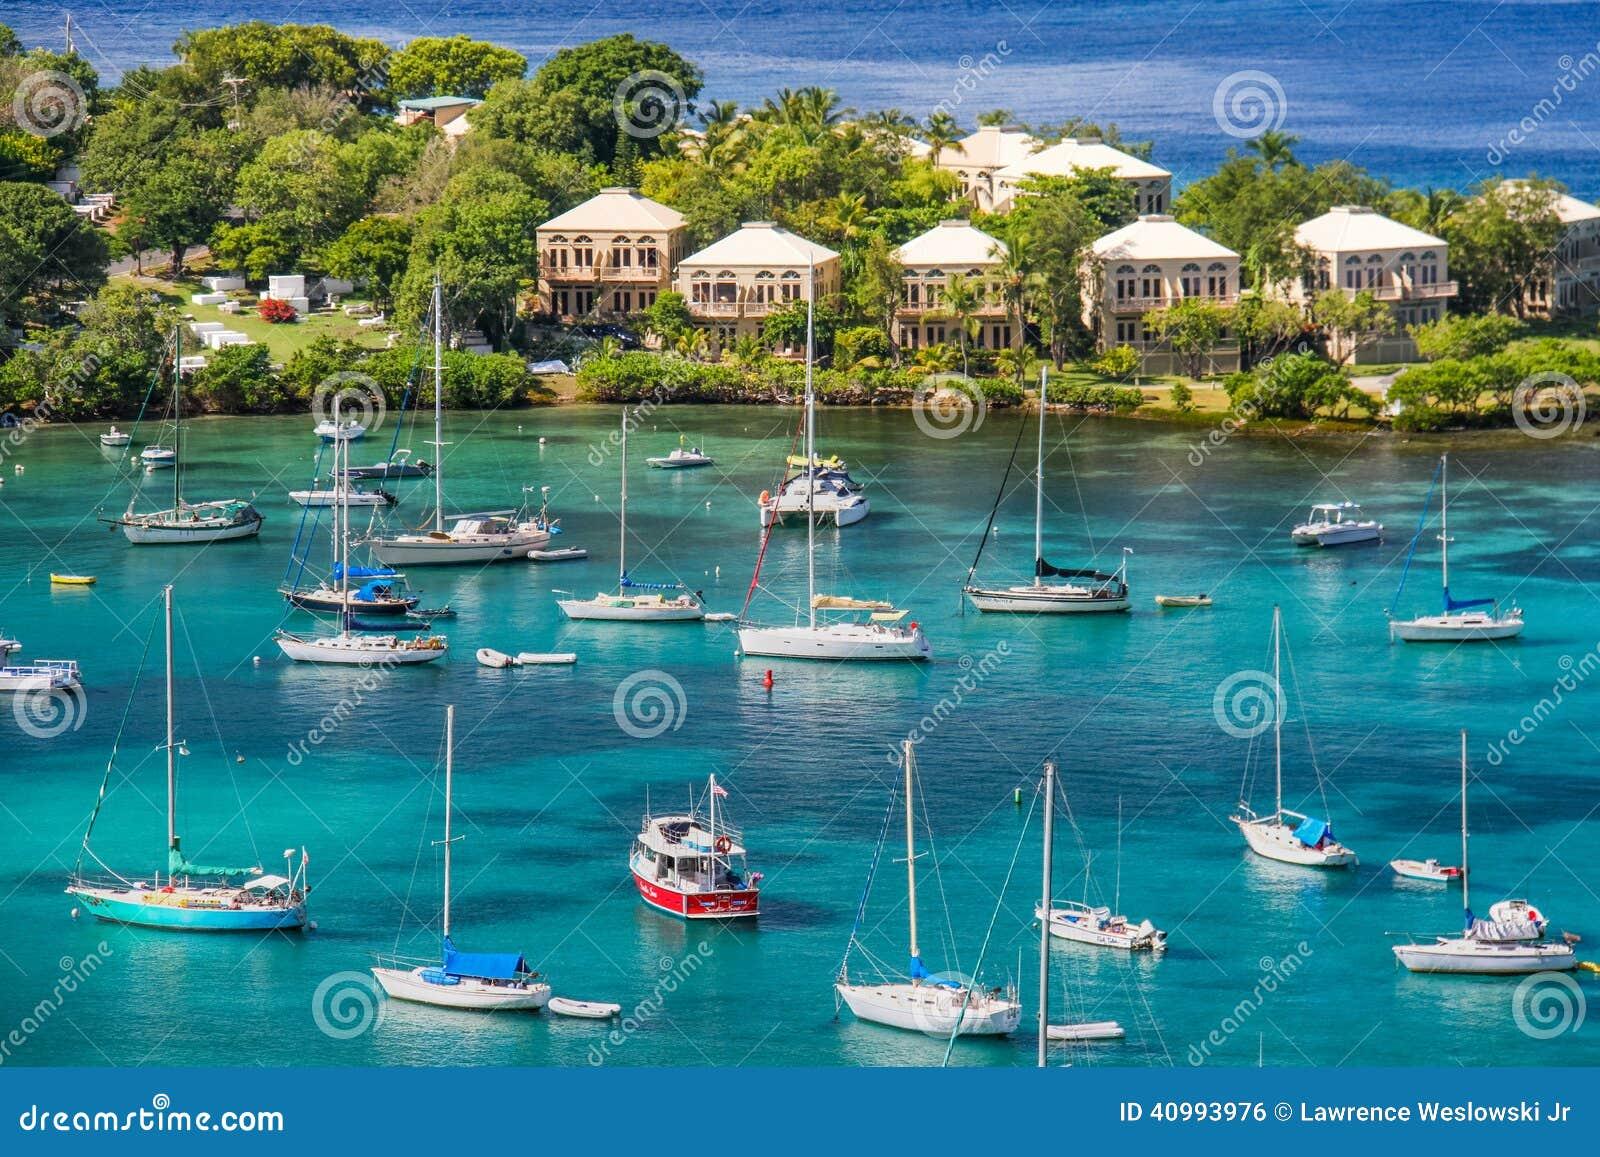 Get A Car To St Johns Us Vigin Island